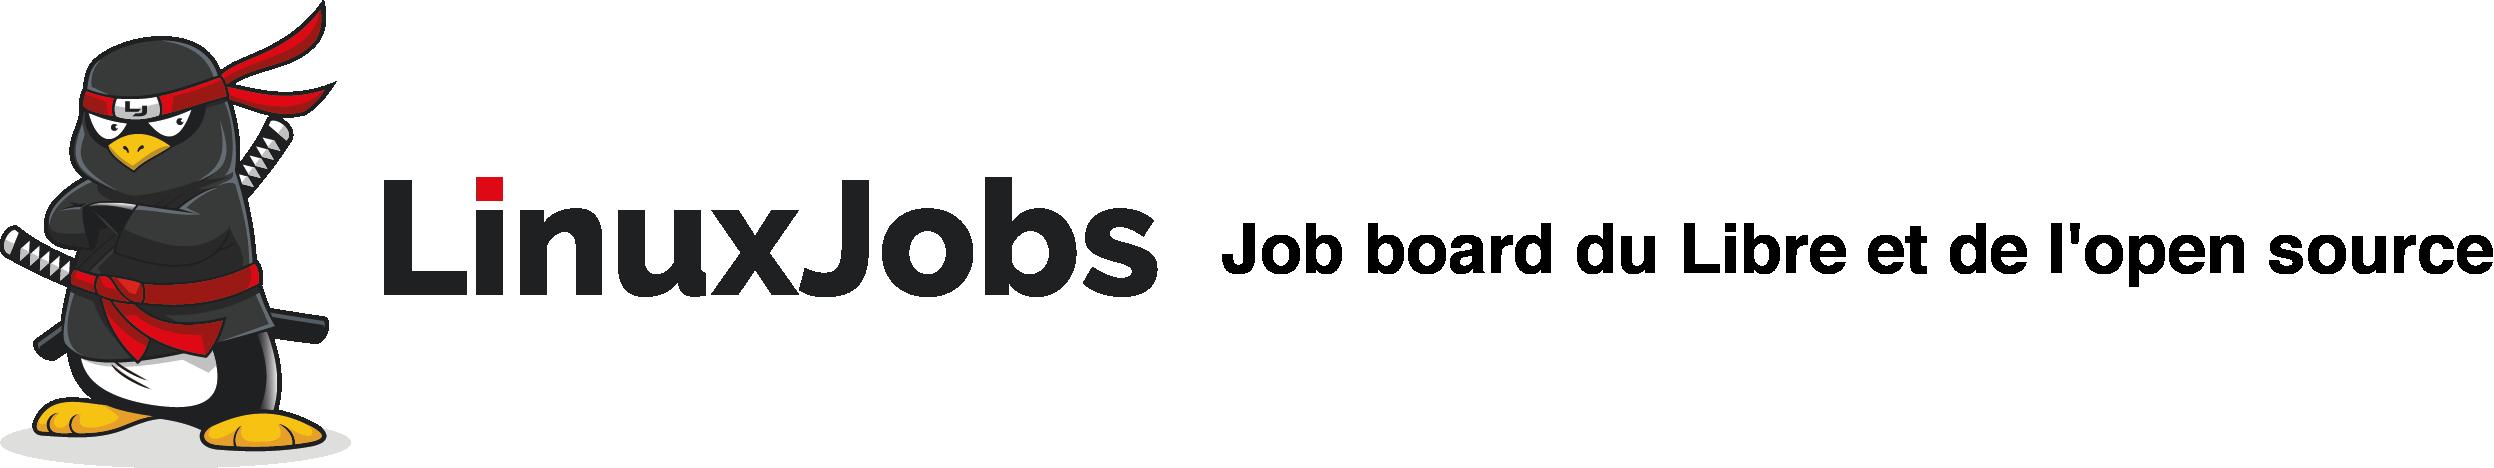 linuxjobs-horizontale